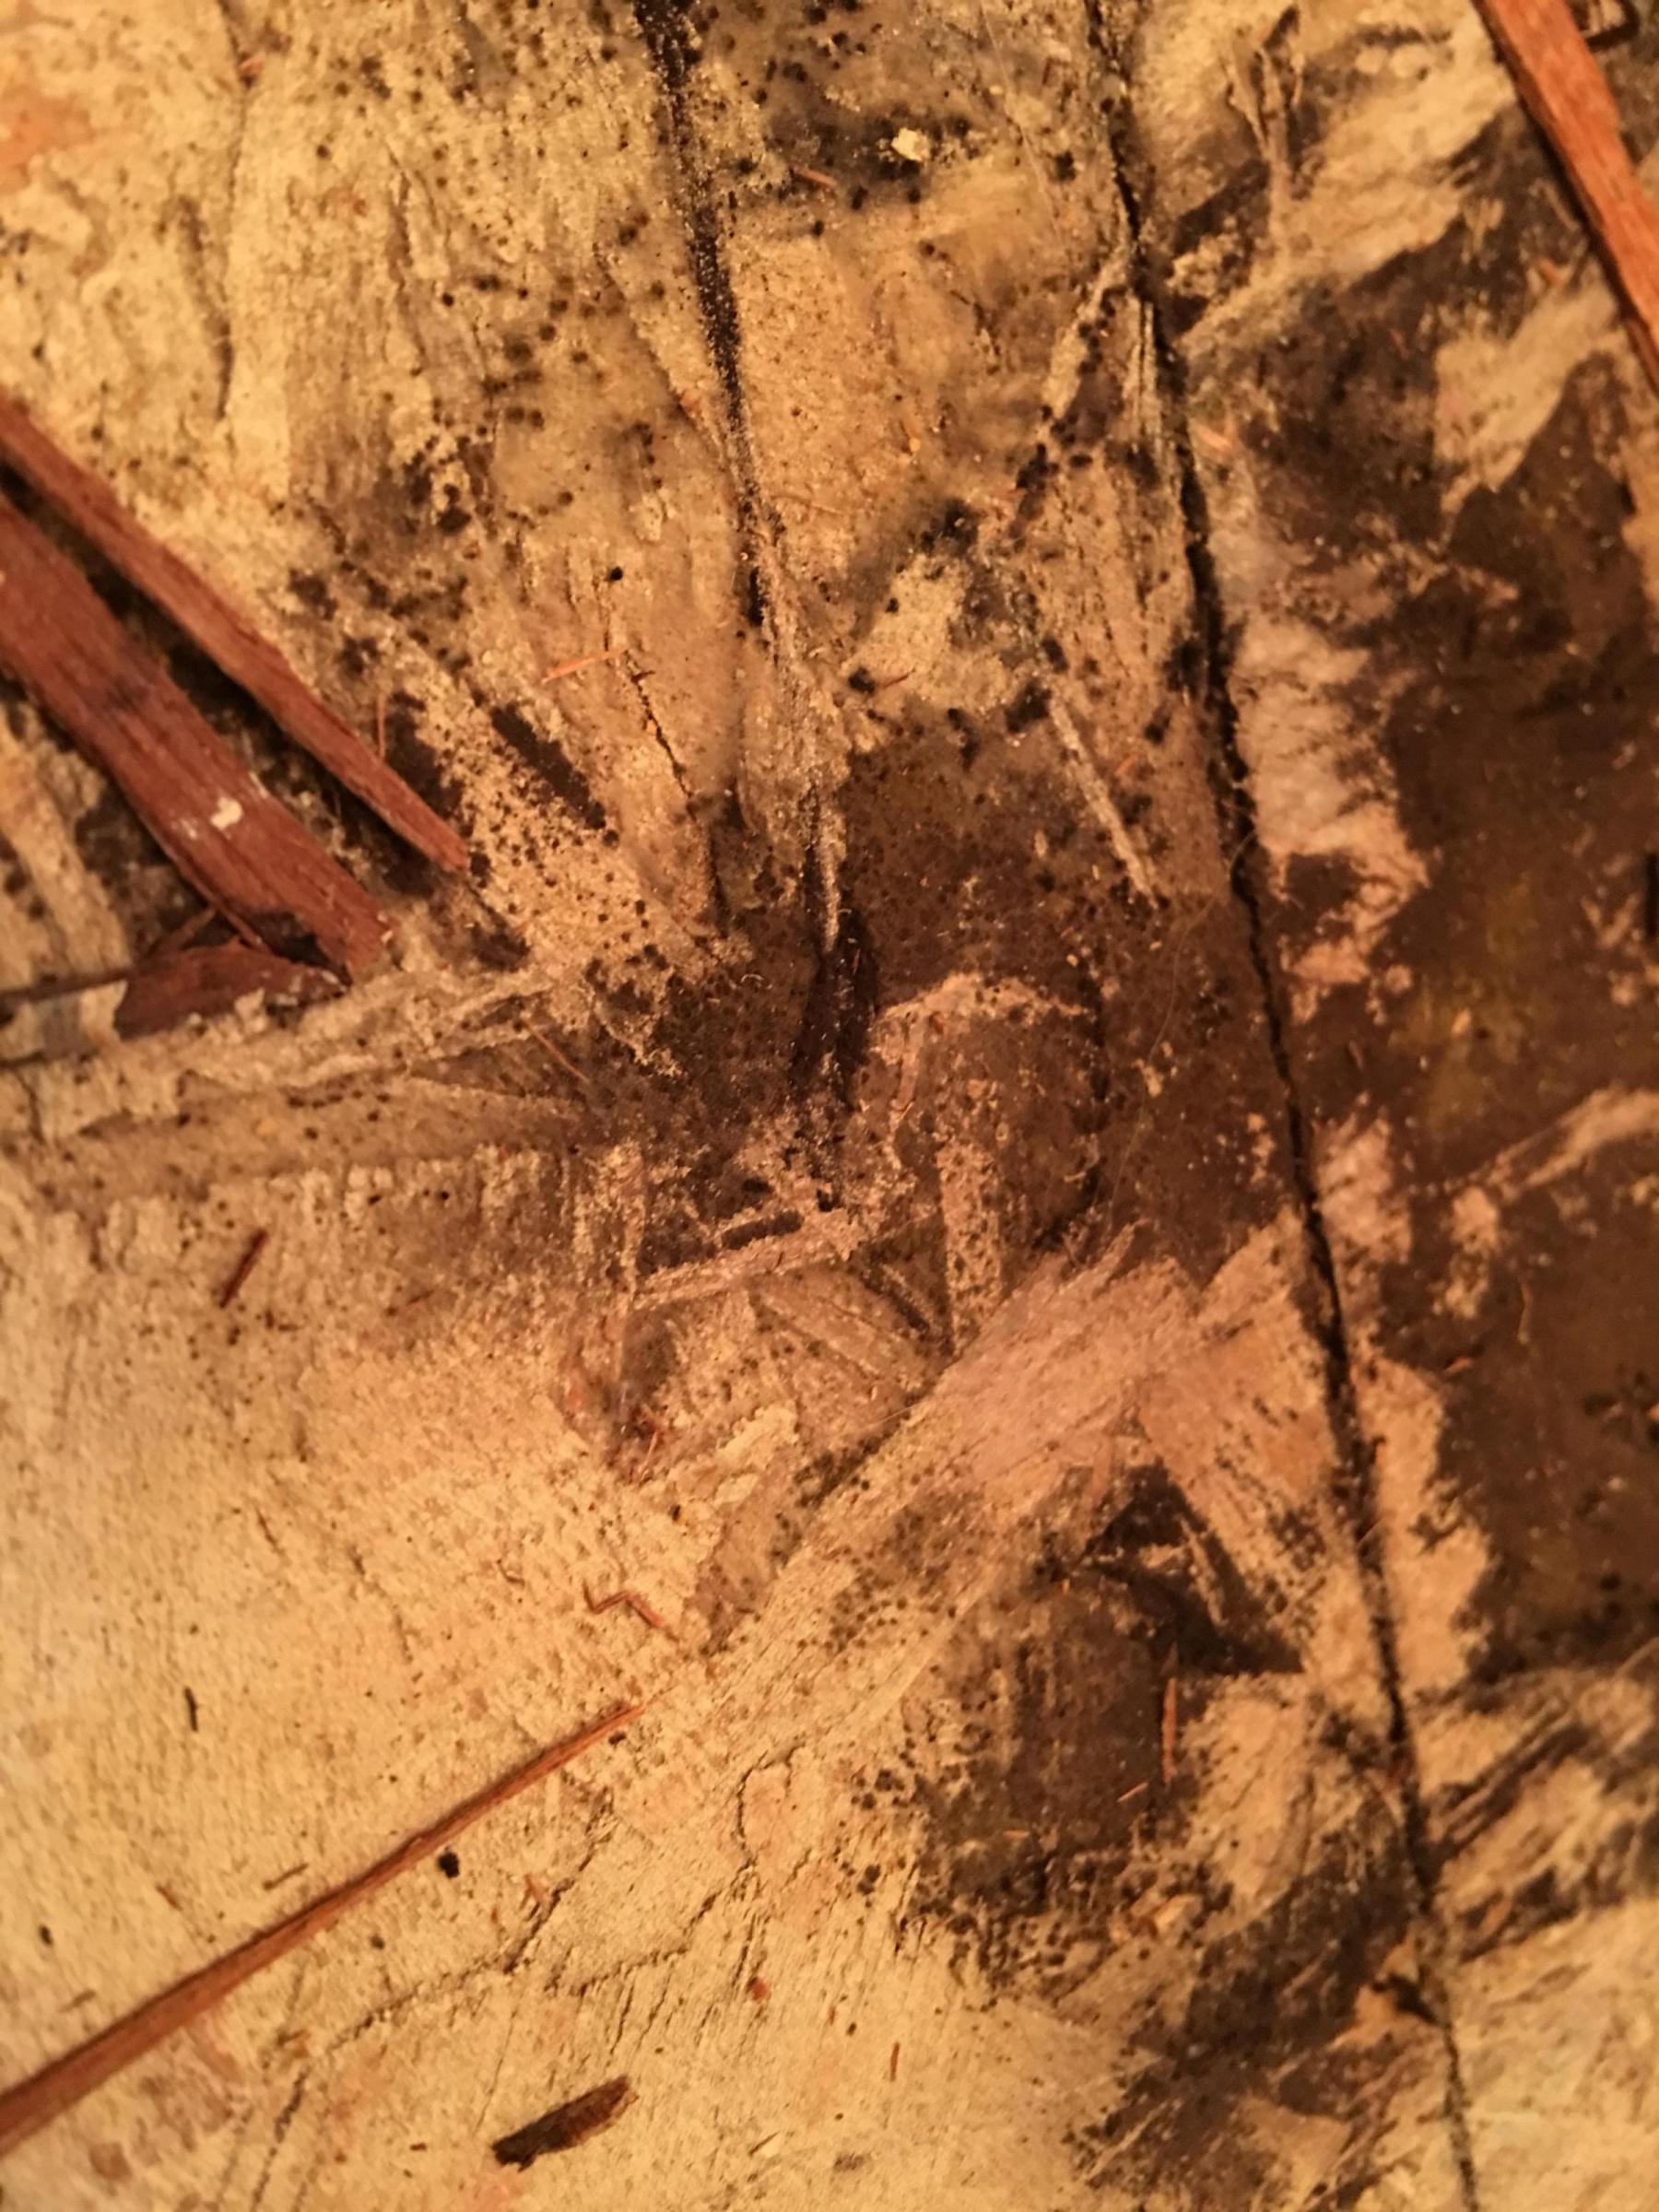 Ripped up bathroom floor found black mold?-168dc587-4026-4a96-8b2a-c69e80679963_1542423235065.jpg